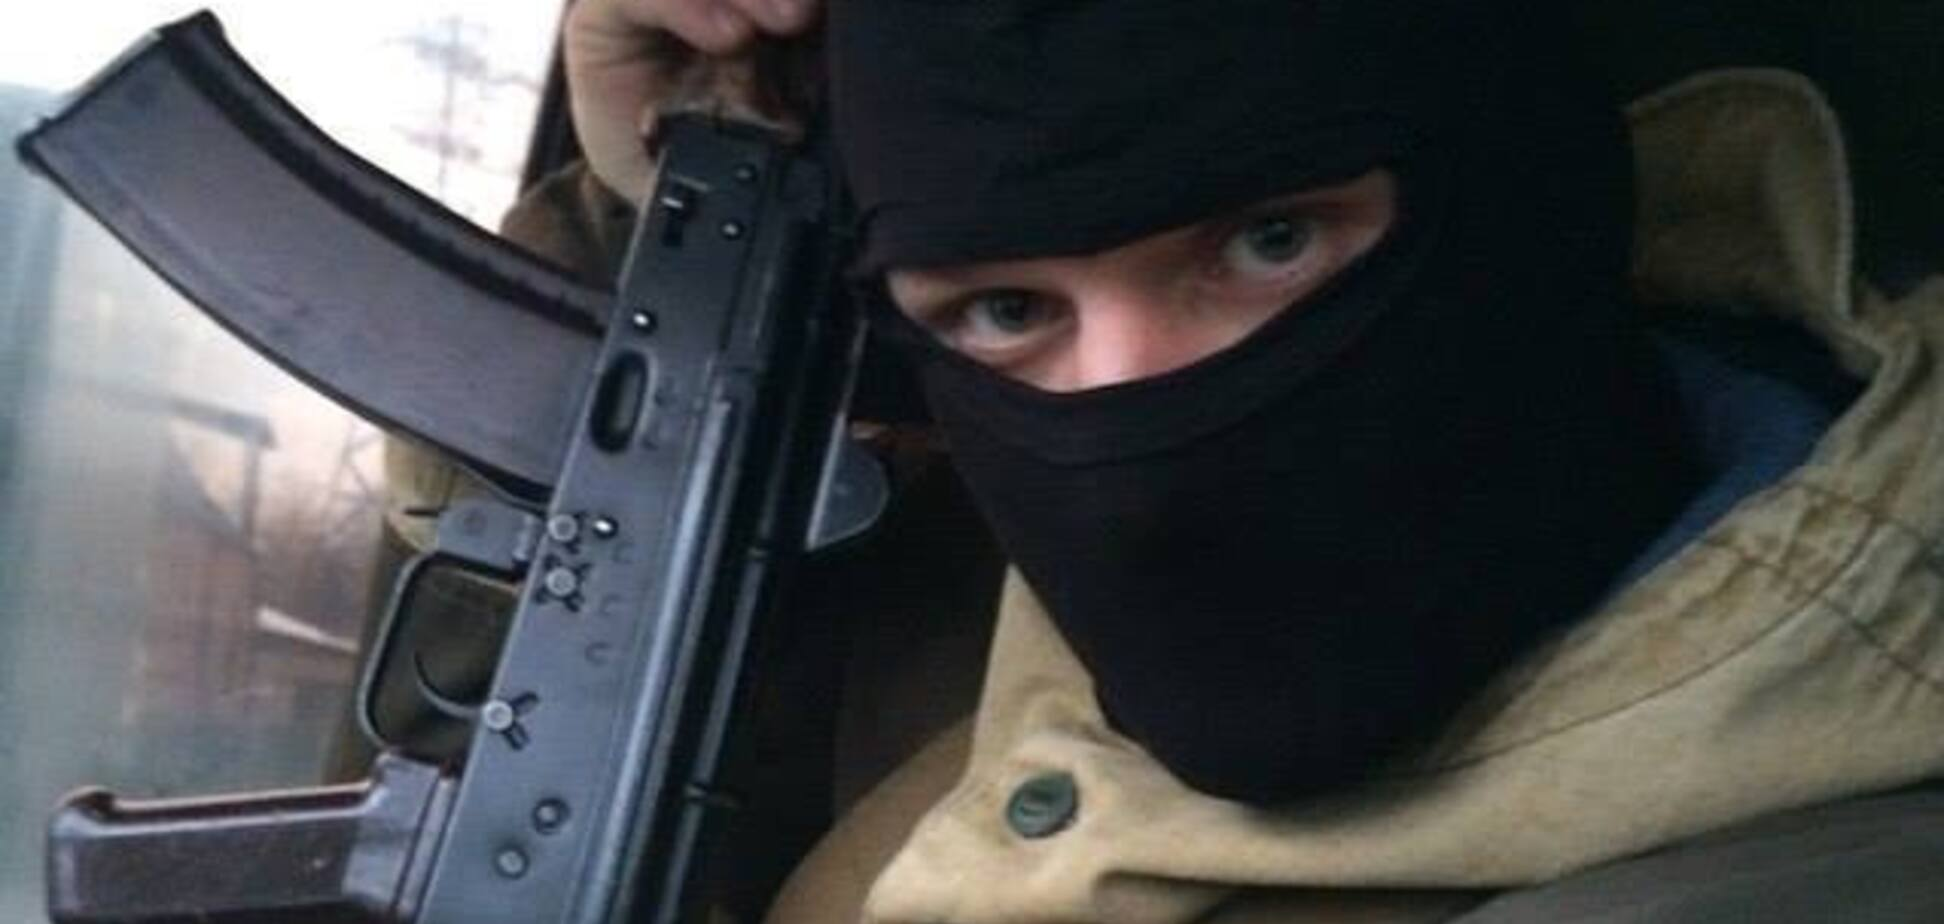 'Щеголял с оружием в руках': на Донбассе поймали опасного террориста 'ДНР'